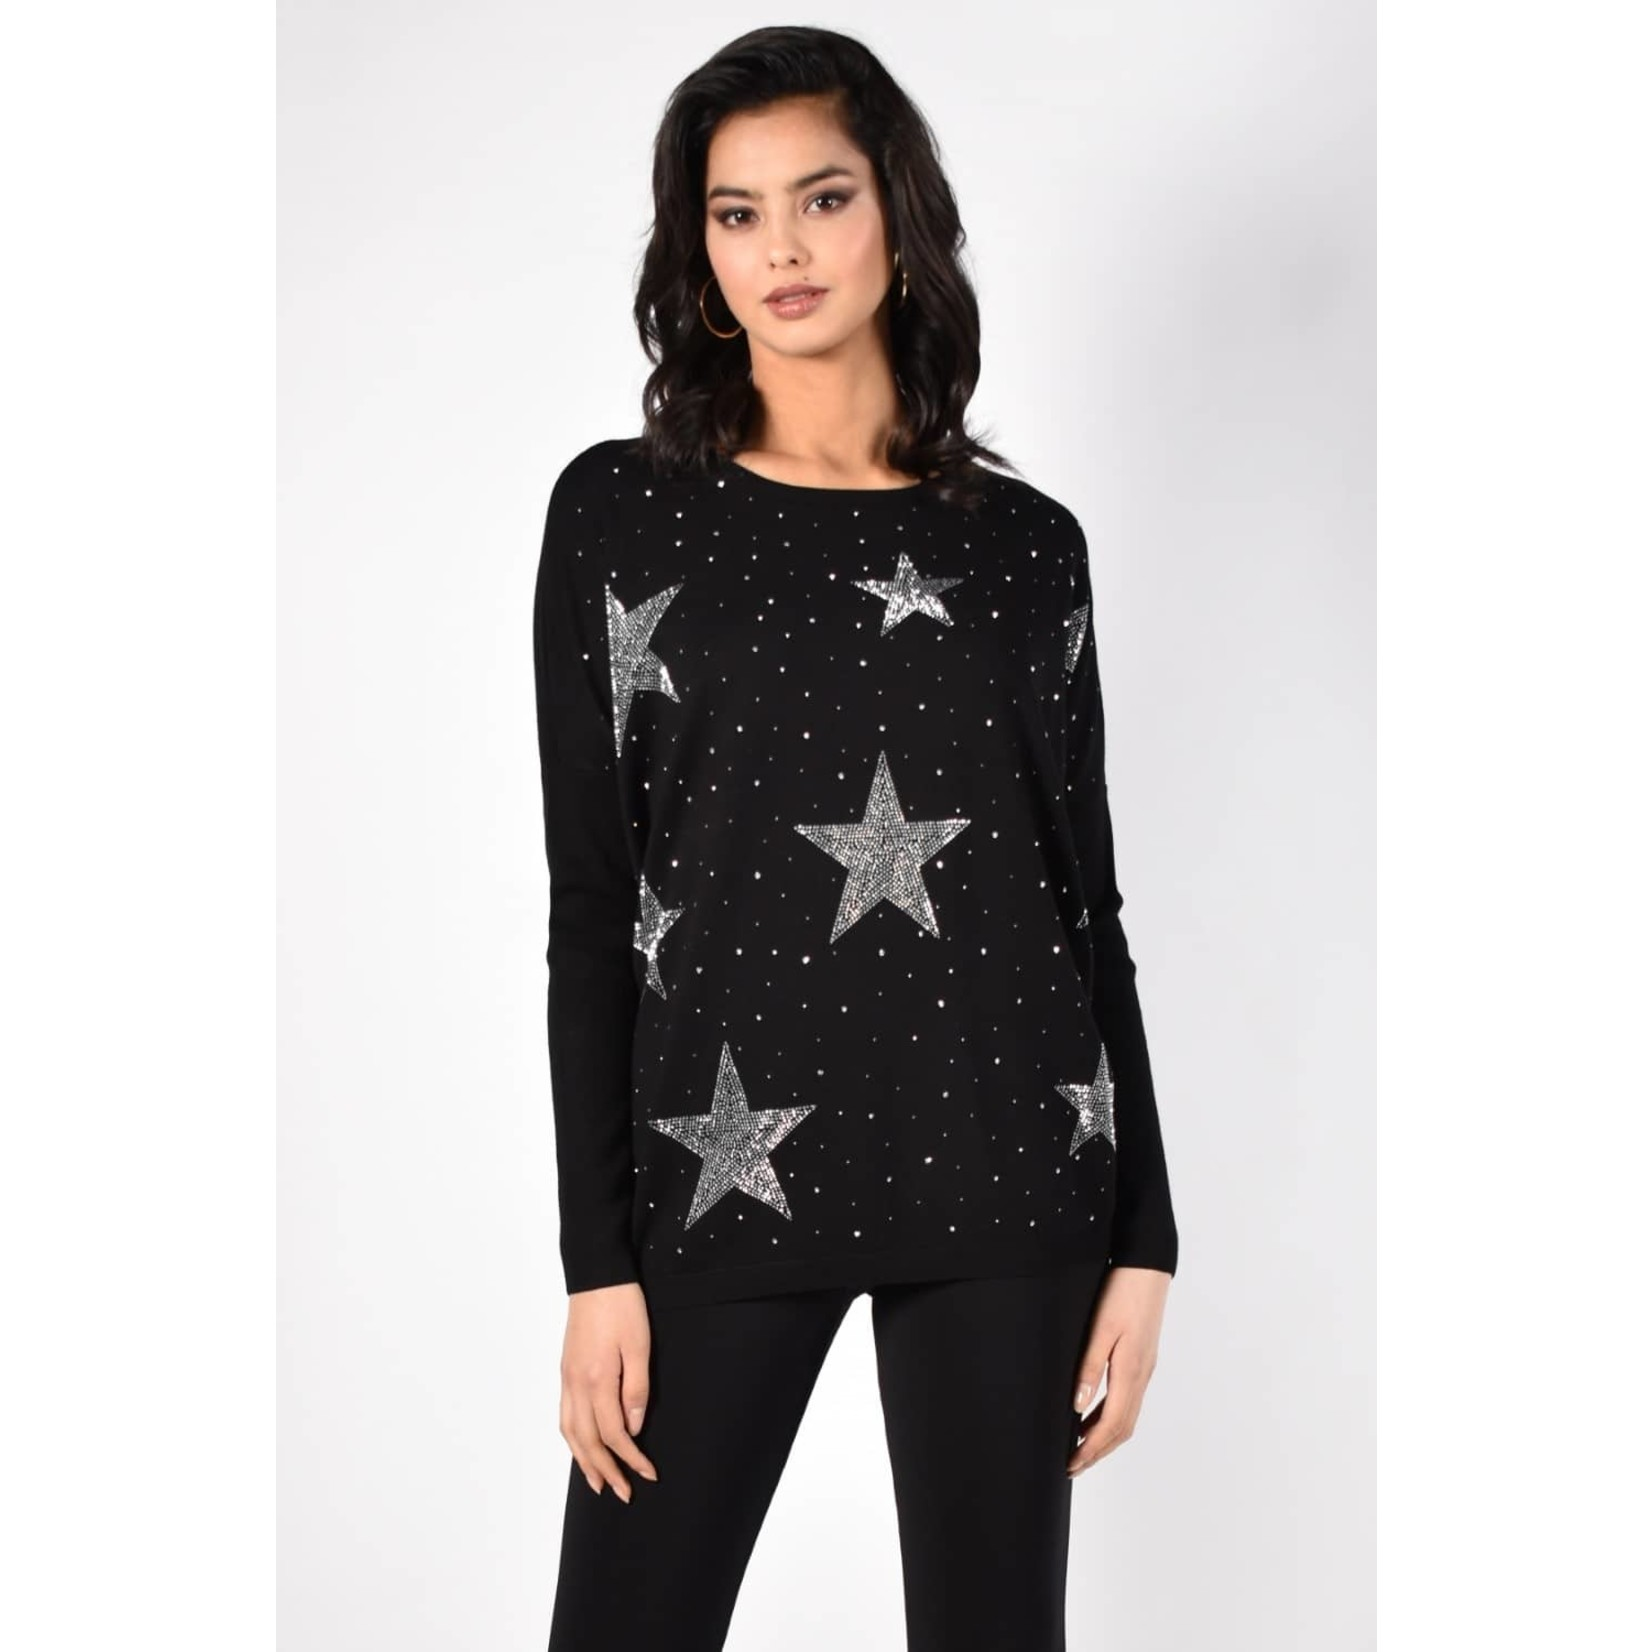 Frank Lyman Black/Silver Sweater Knit 213142U